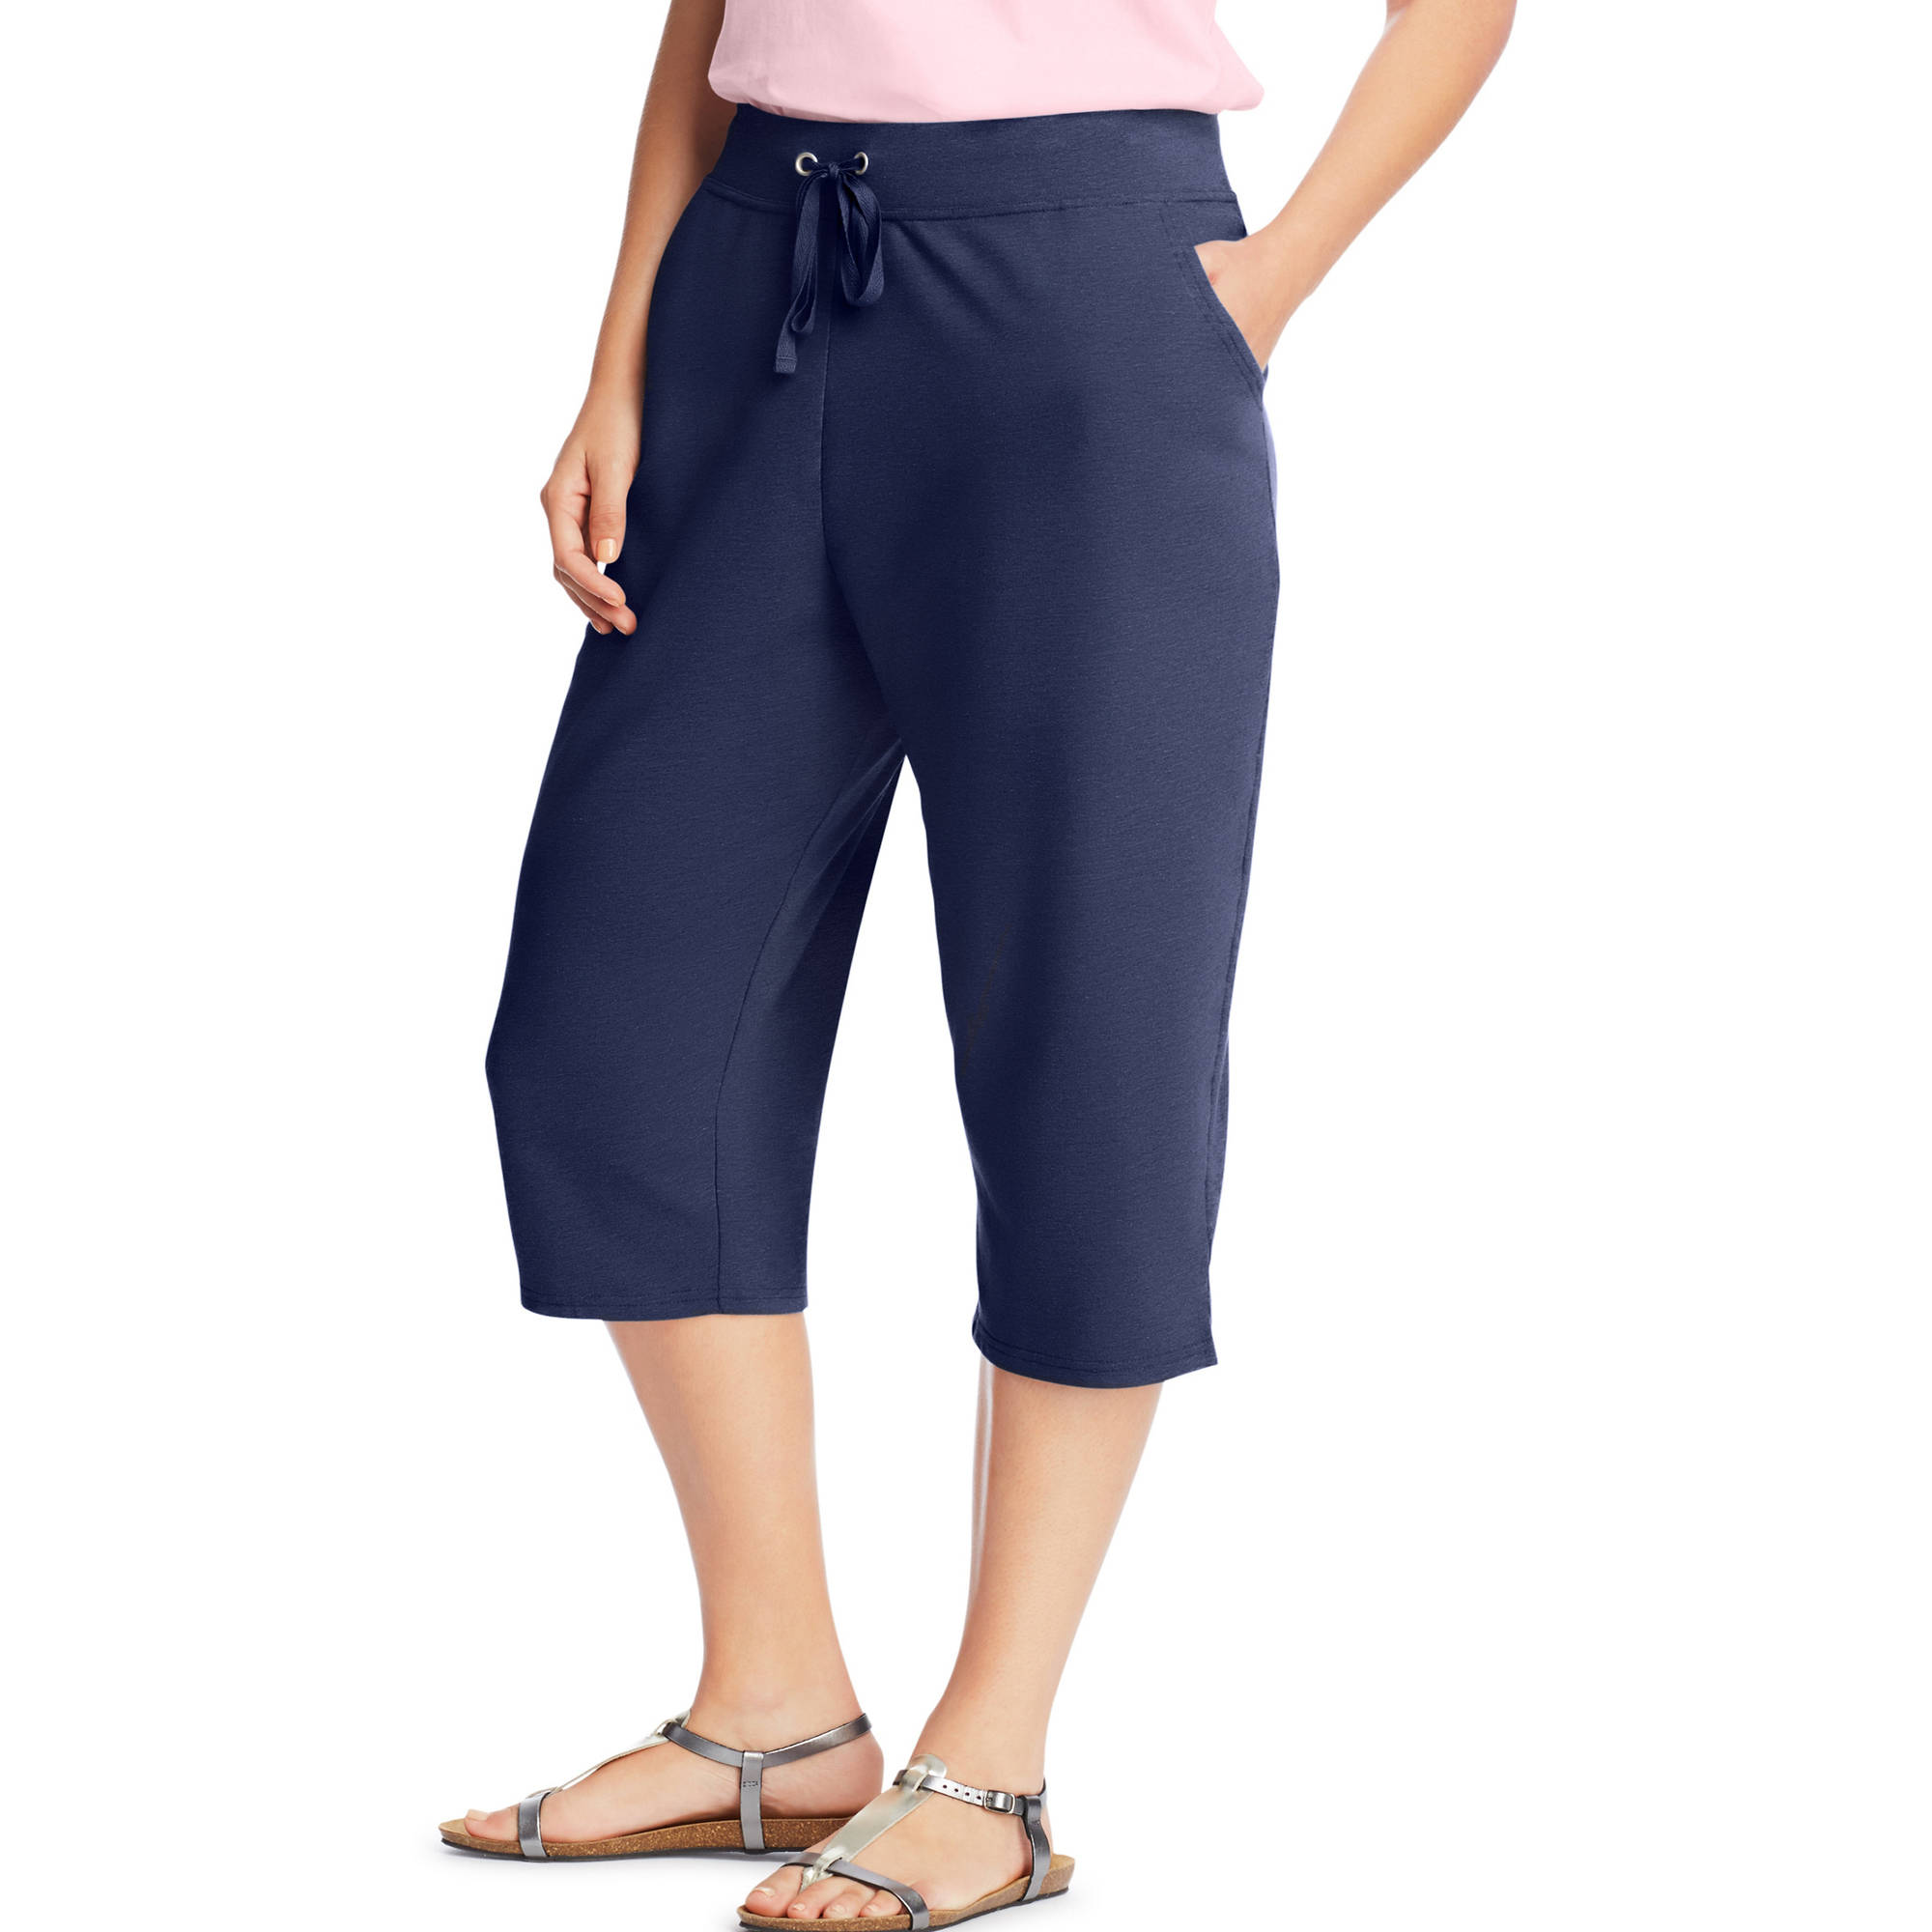 Just My Size Women's Plus-Size French Terry Pocket Capri